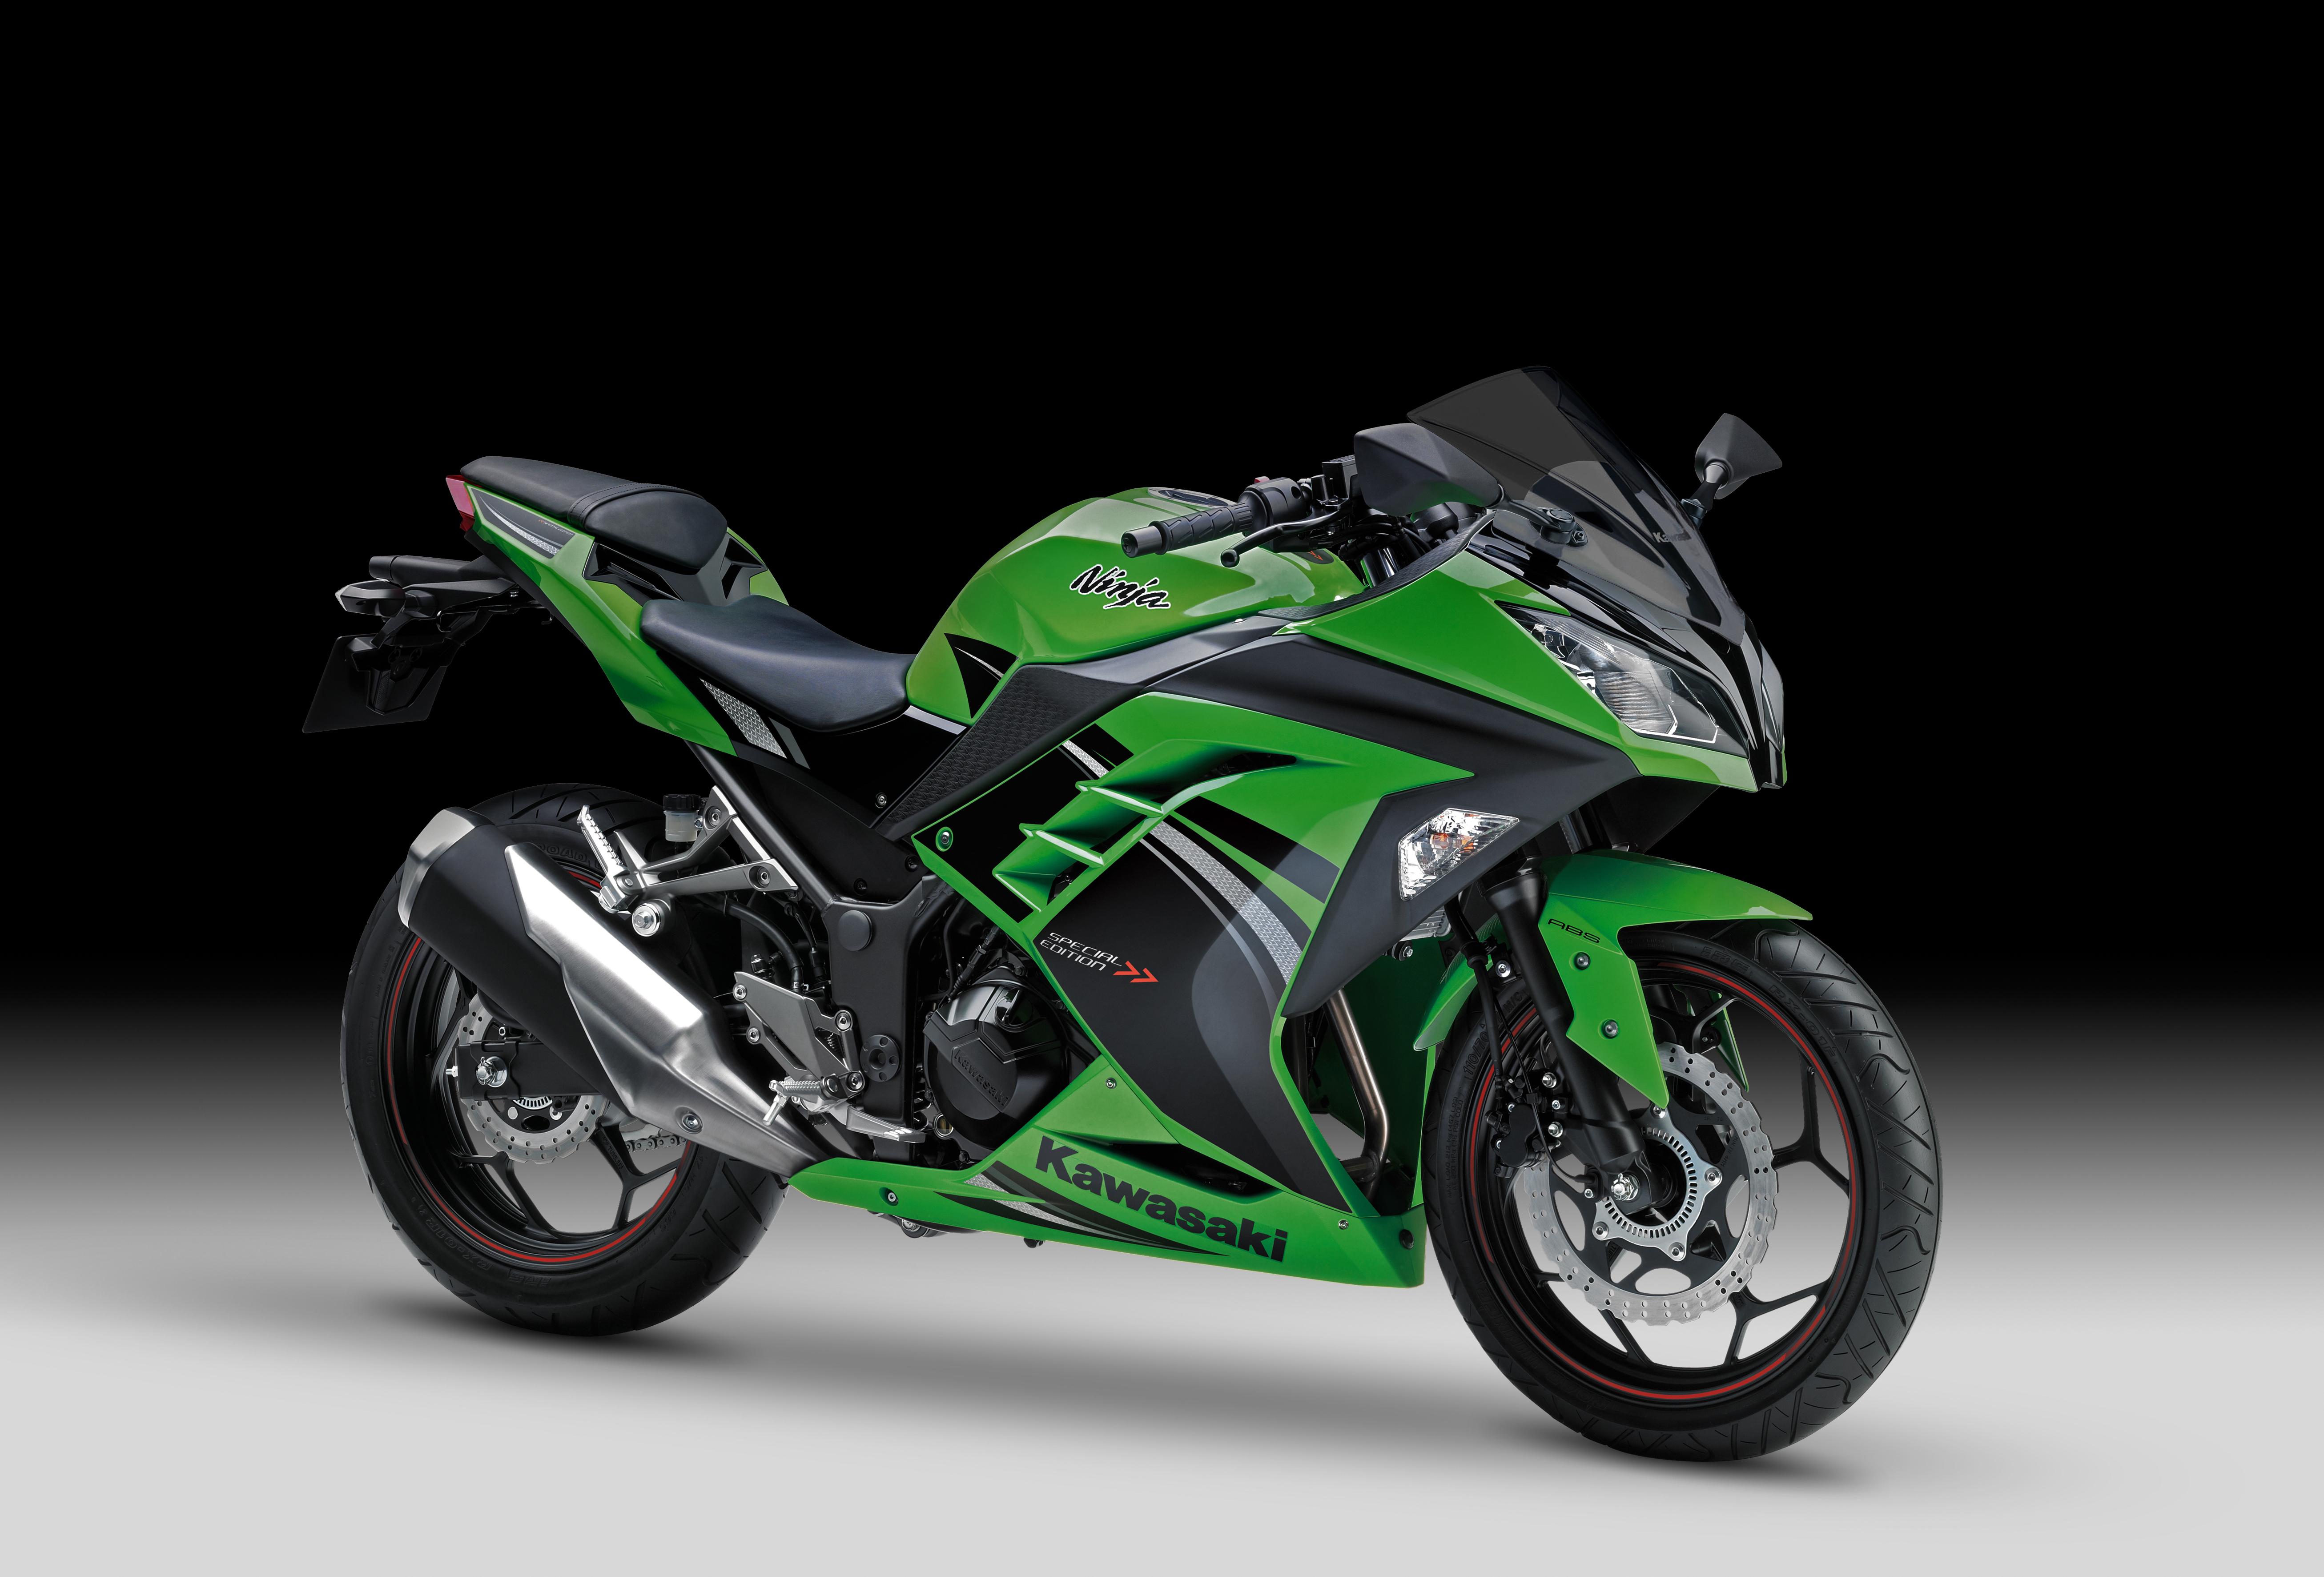 Kawasaki Reveals Ninja 300 Special Edition Visordown